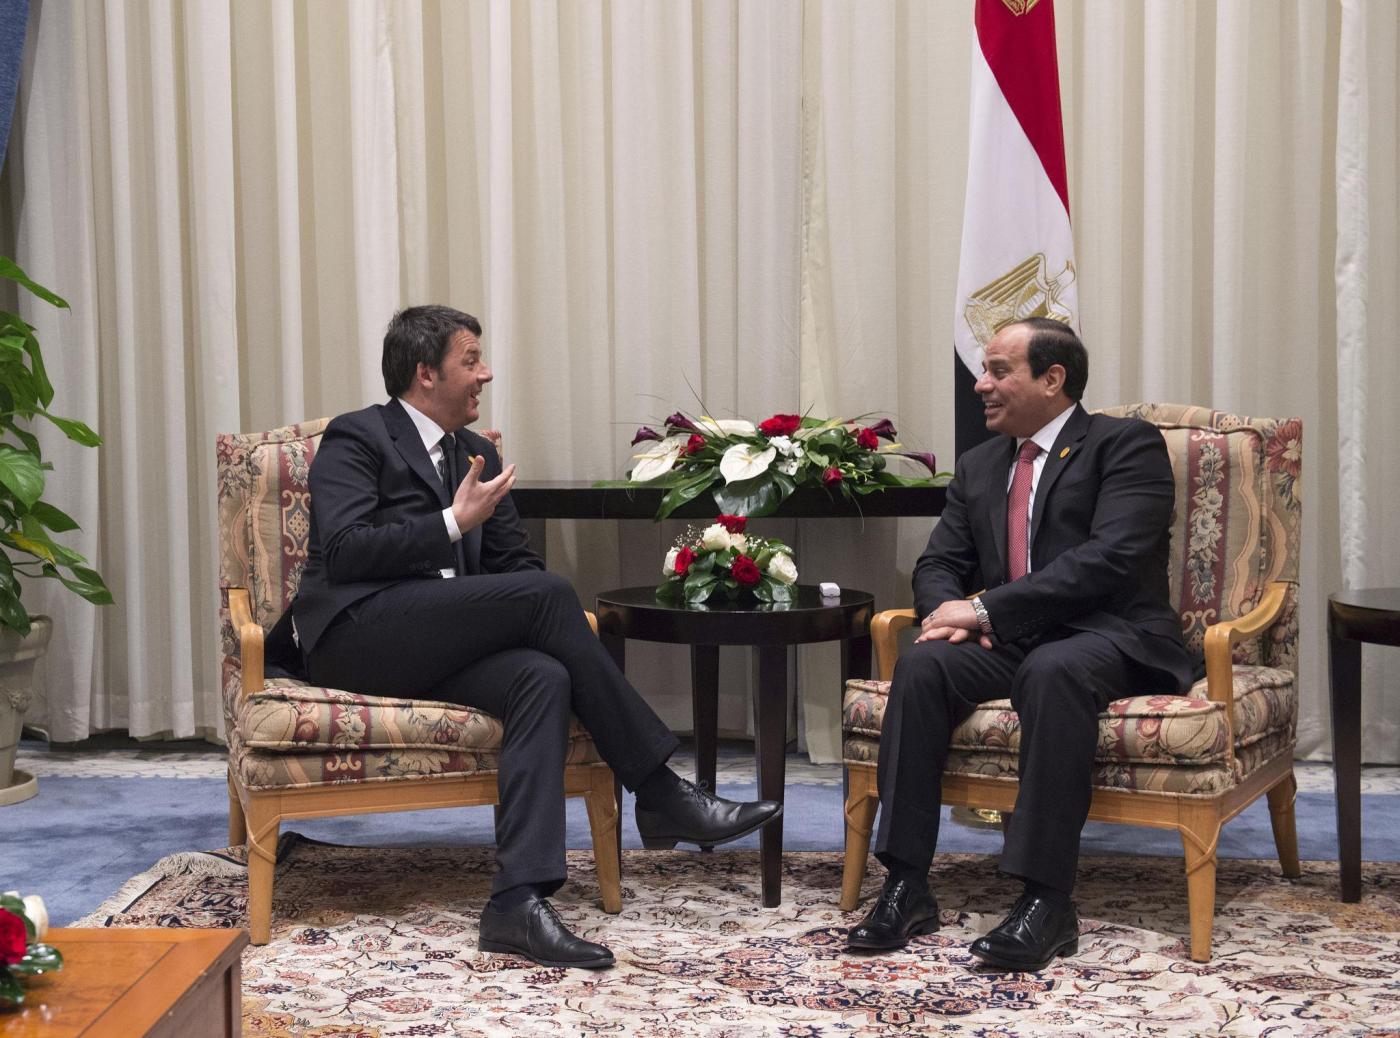 Egitto, Matteo Renzi a Sharm el Sheikh